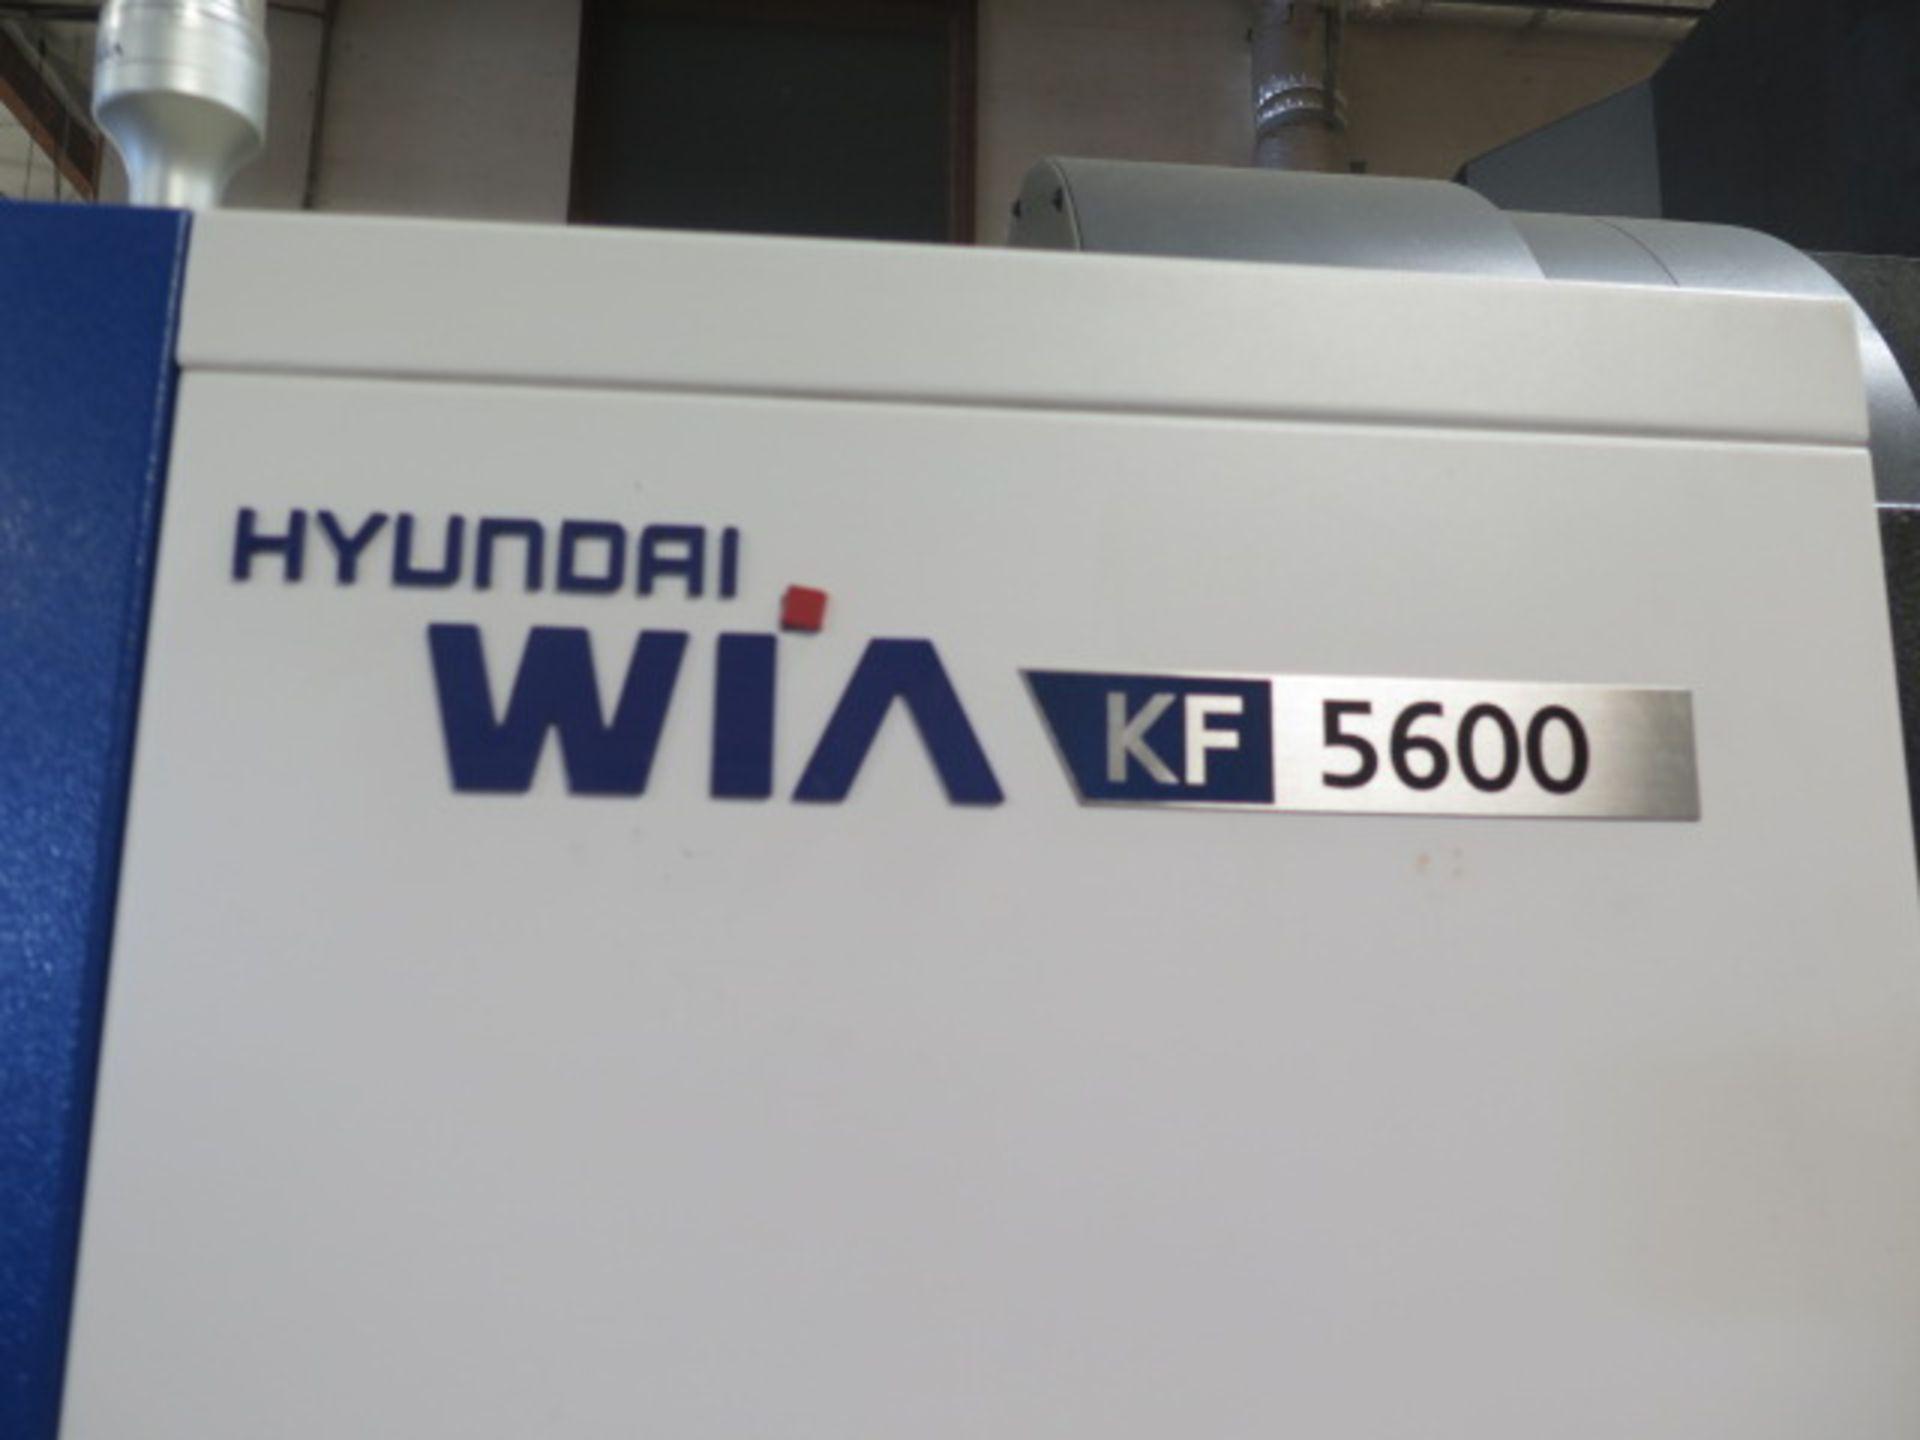 2017 Hyundai WIA KF5600 CNC VMC s/n G2689-0086 w/ Hyundai WIA Fanuc i-Series, SOLD AS IS - Image 4 of 22